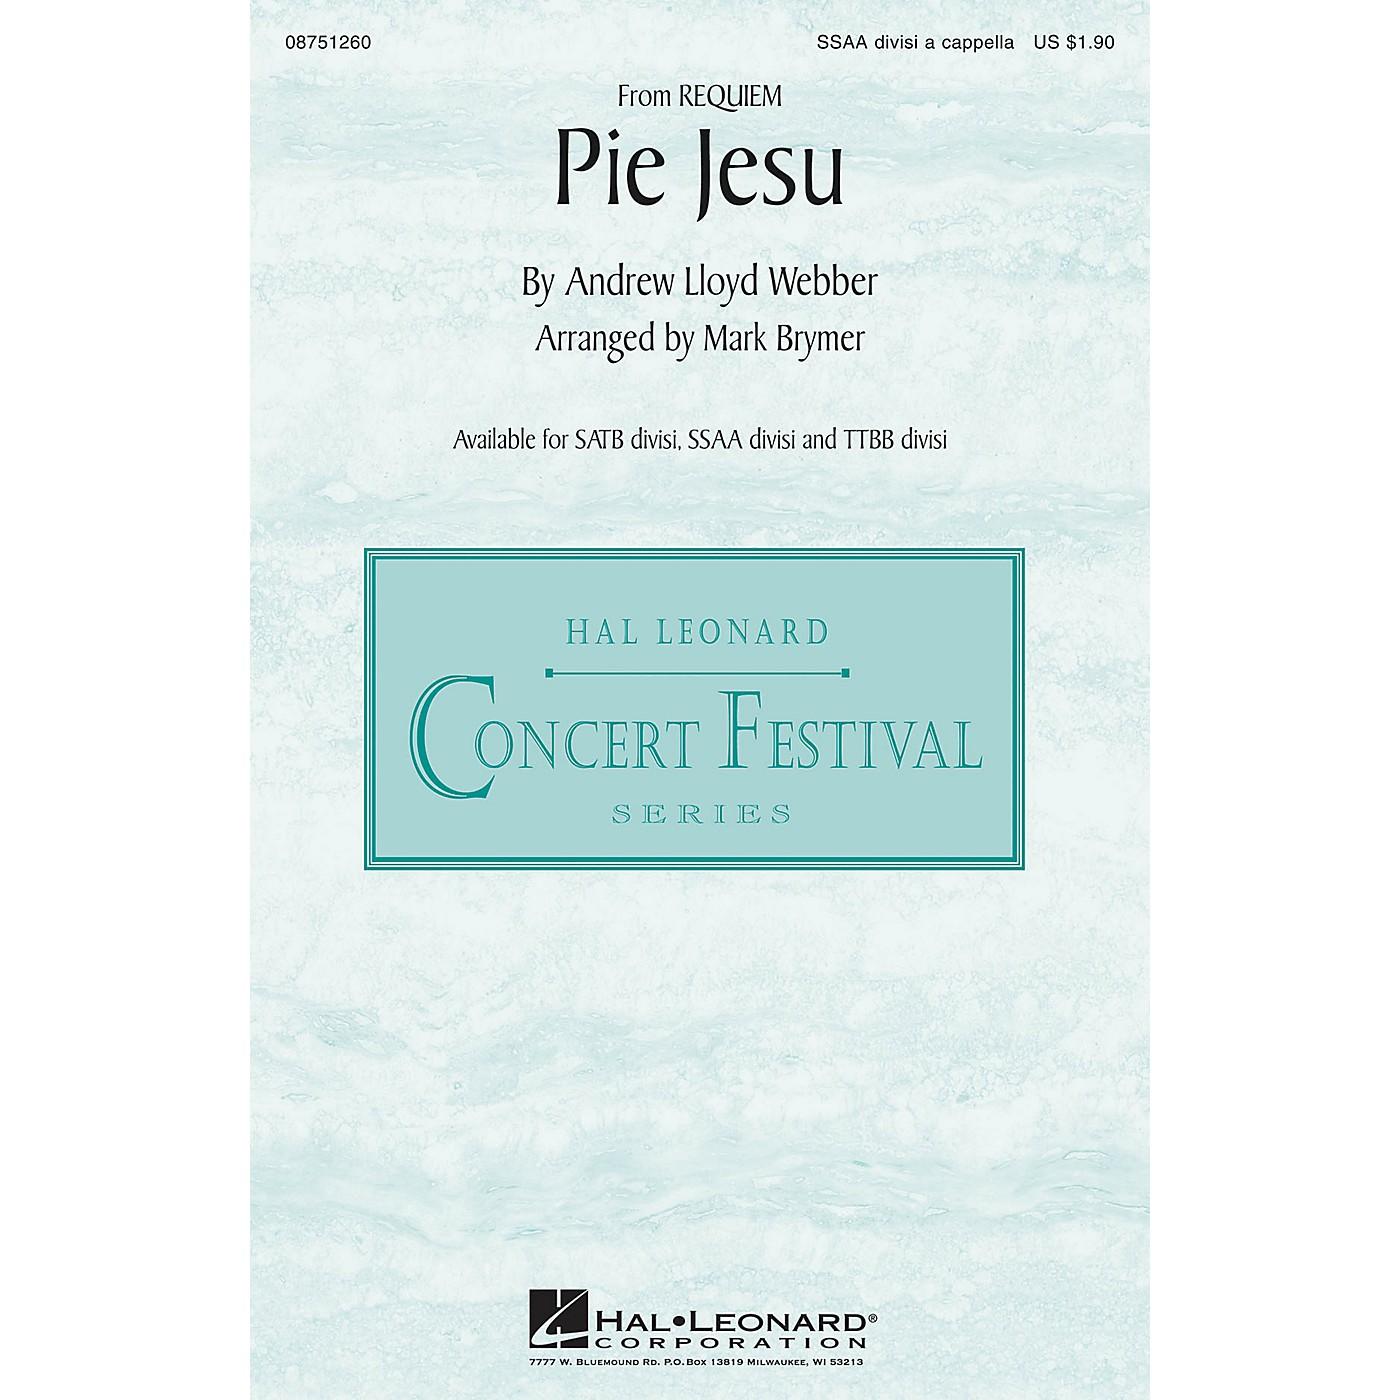 Hal Leonard Pie Jesu (from Requiem) SSAA Div A Cappella arranged by Mark Brymer thumbnail